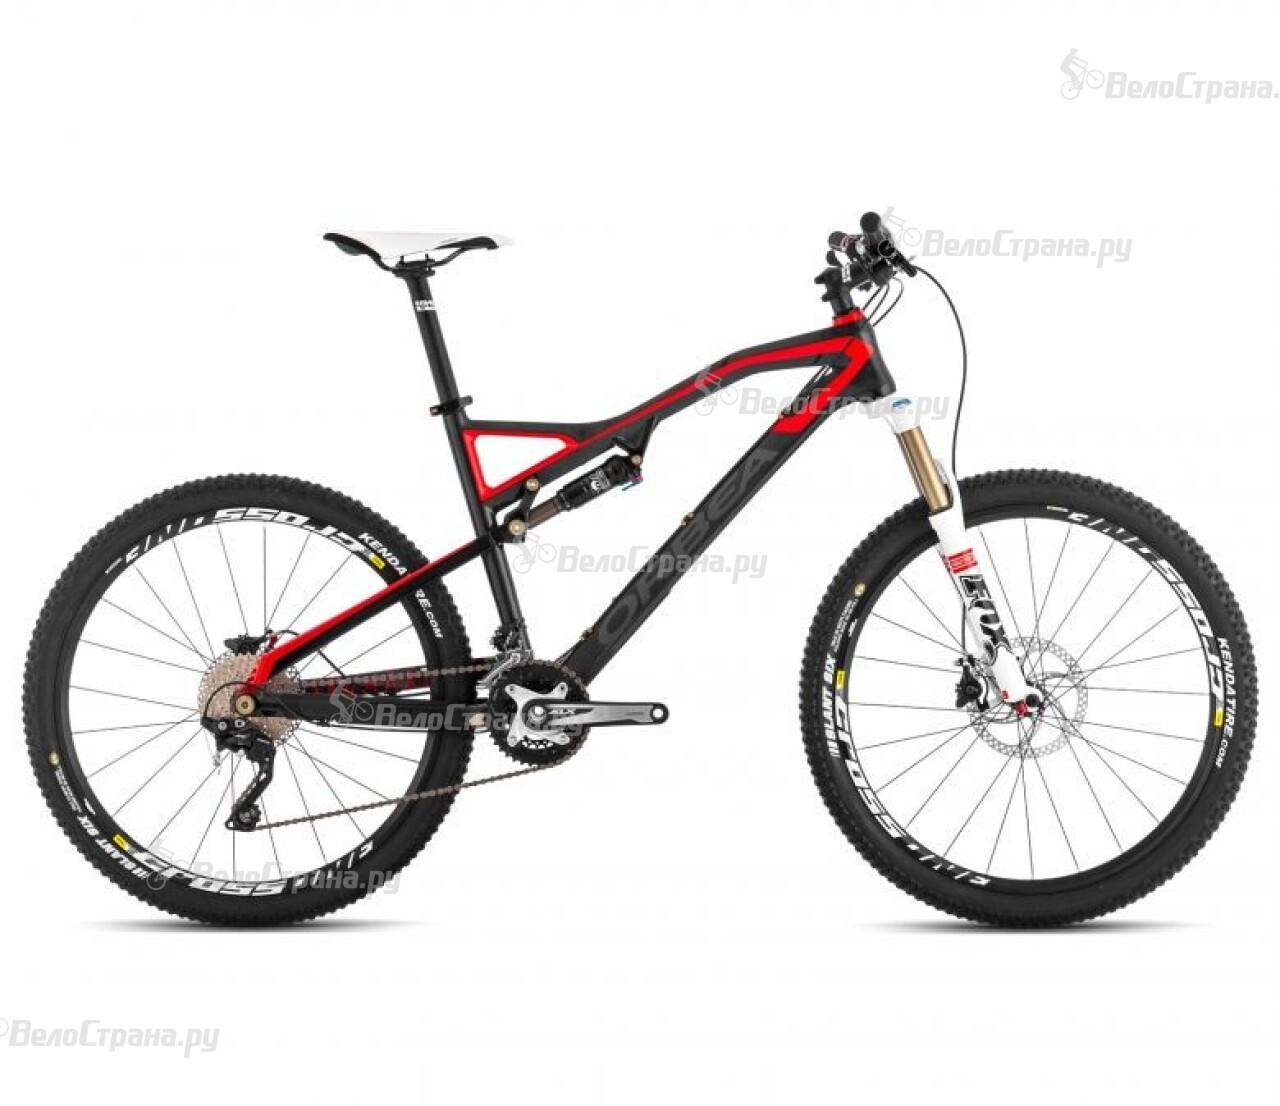 Велосипед Orbea Occam M50 (2014) аккумулятор для ноутбука oem 5200mah asus n61 n61j n61d n61v n61vg n61ja n61jv n53 a32 m50 m50s n53s n53sv a32 m50 a32 n61 a32 x 64 33 m50 n53s n53 a32 m50 m50s n53s n53sv a32 m50